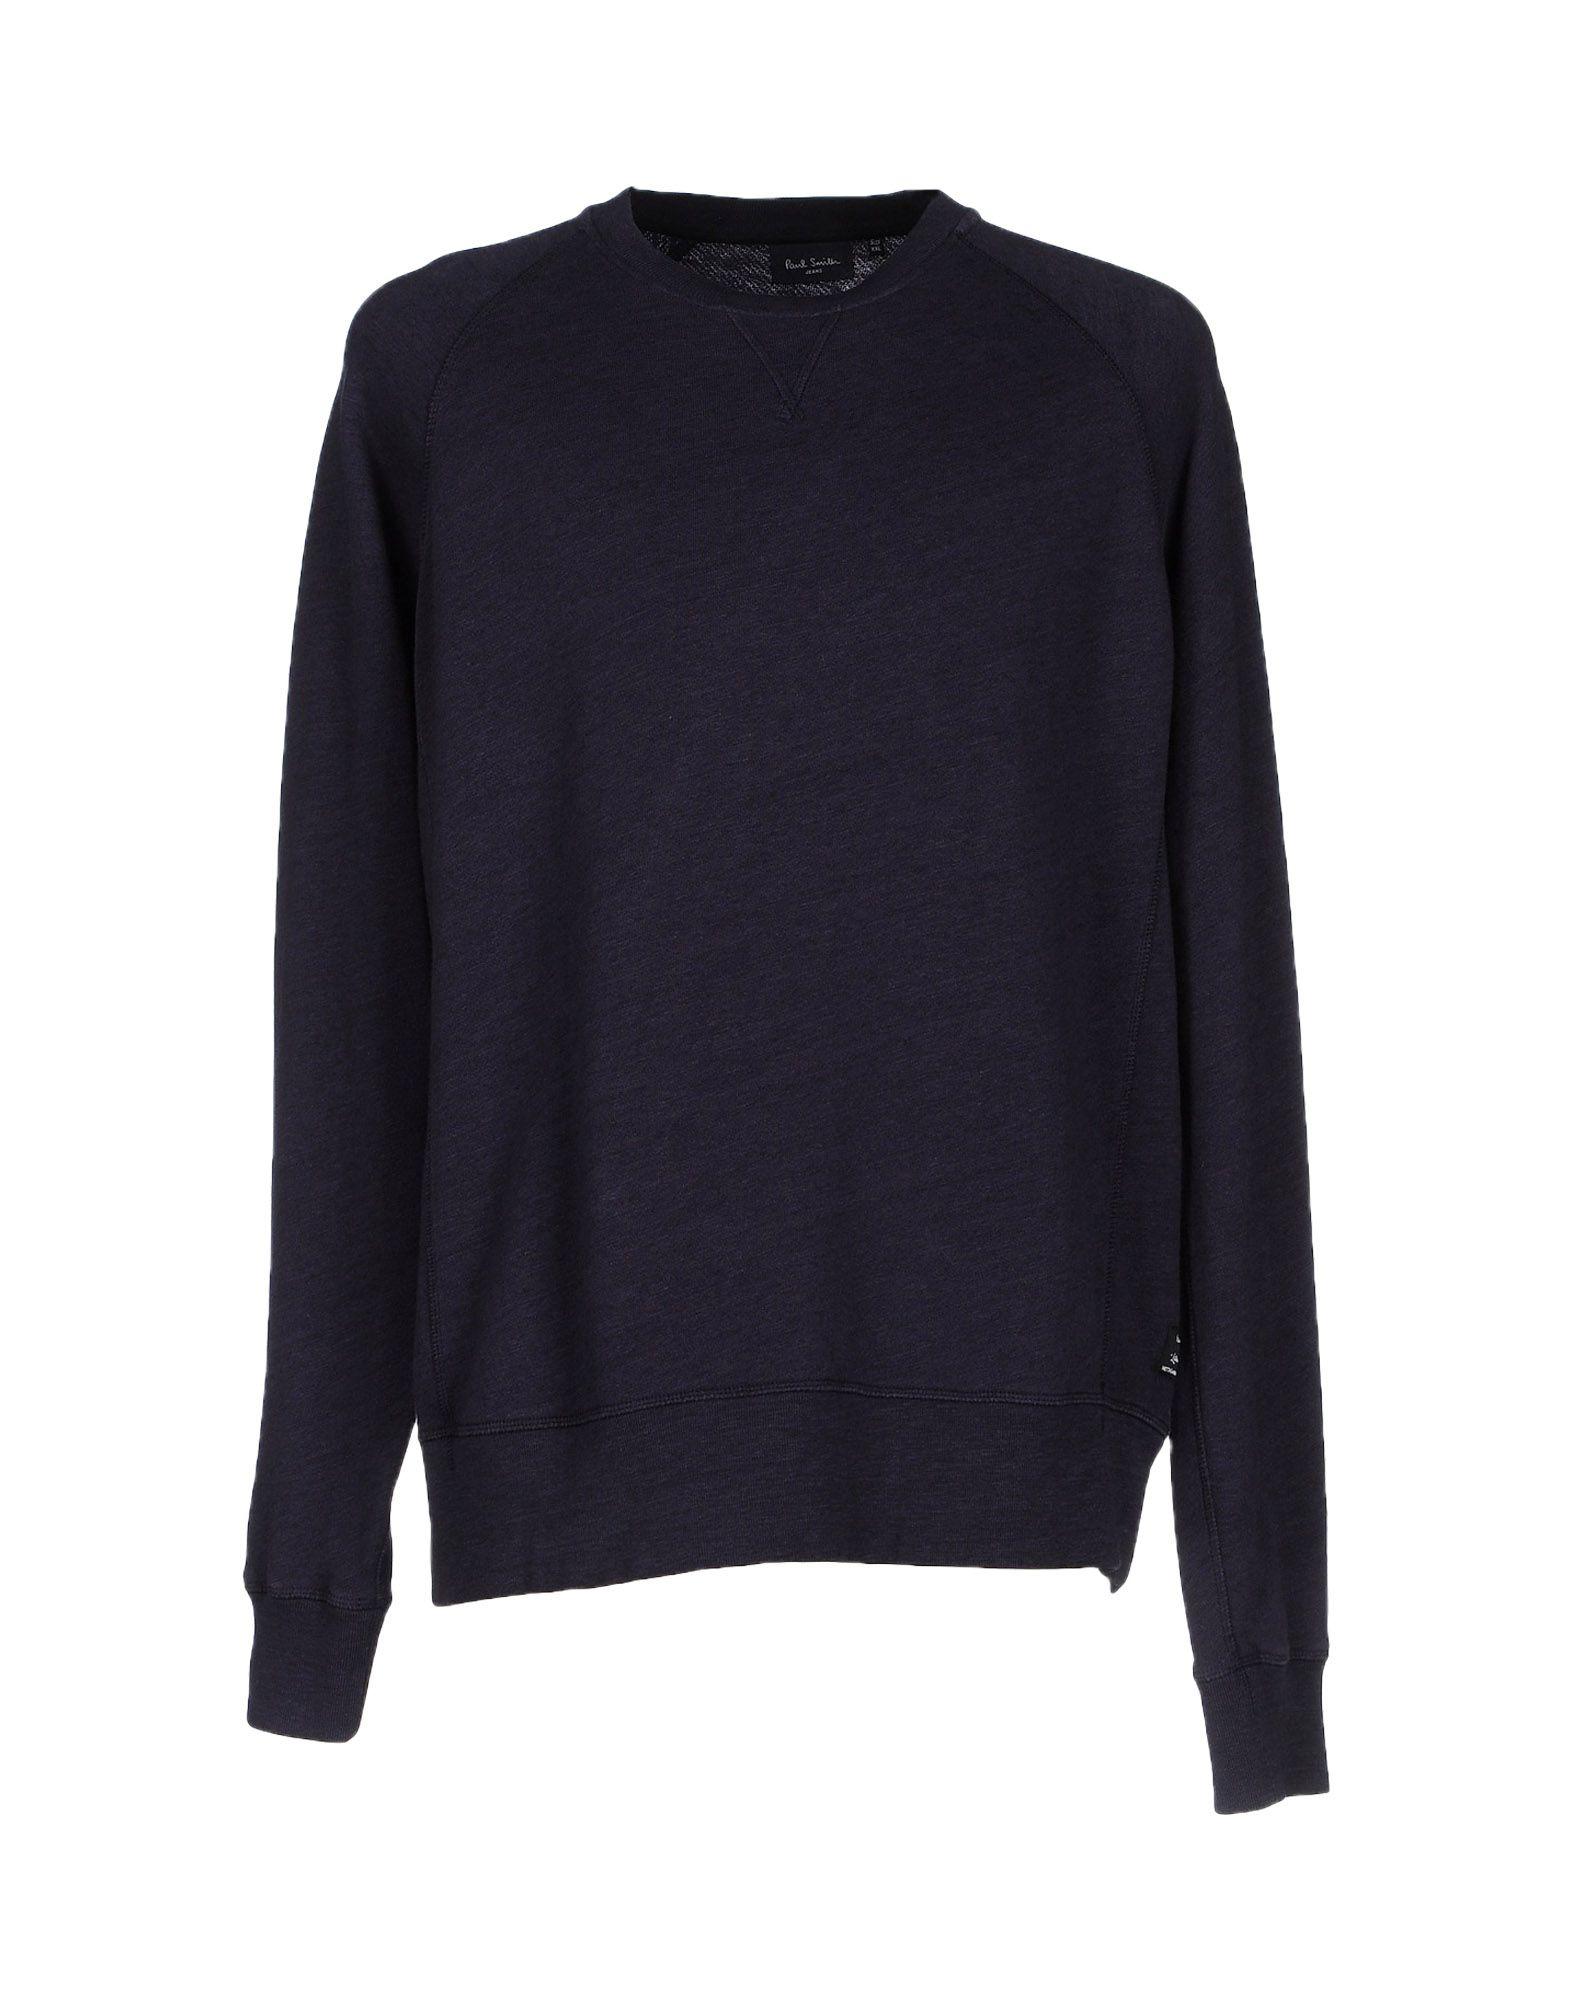 PAUL SMITH JEANS Sweatshirts